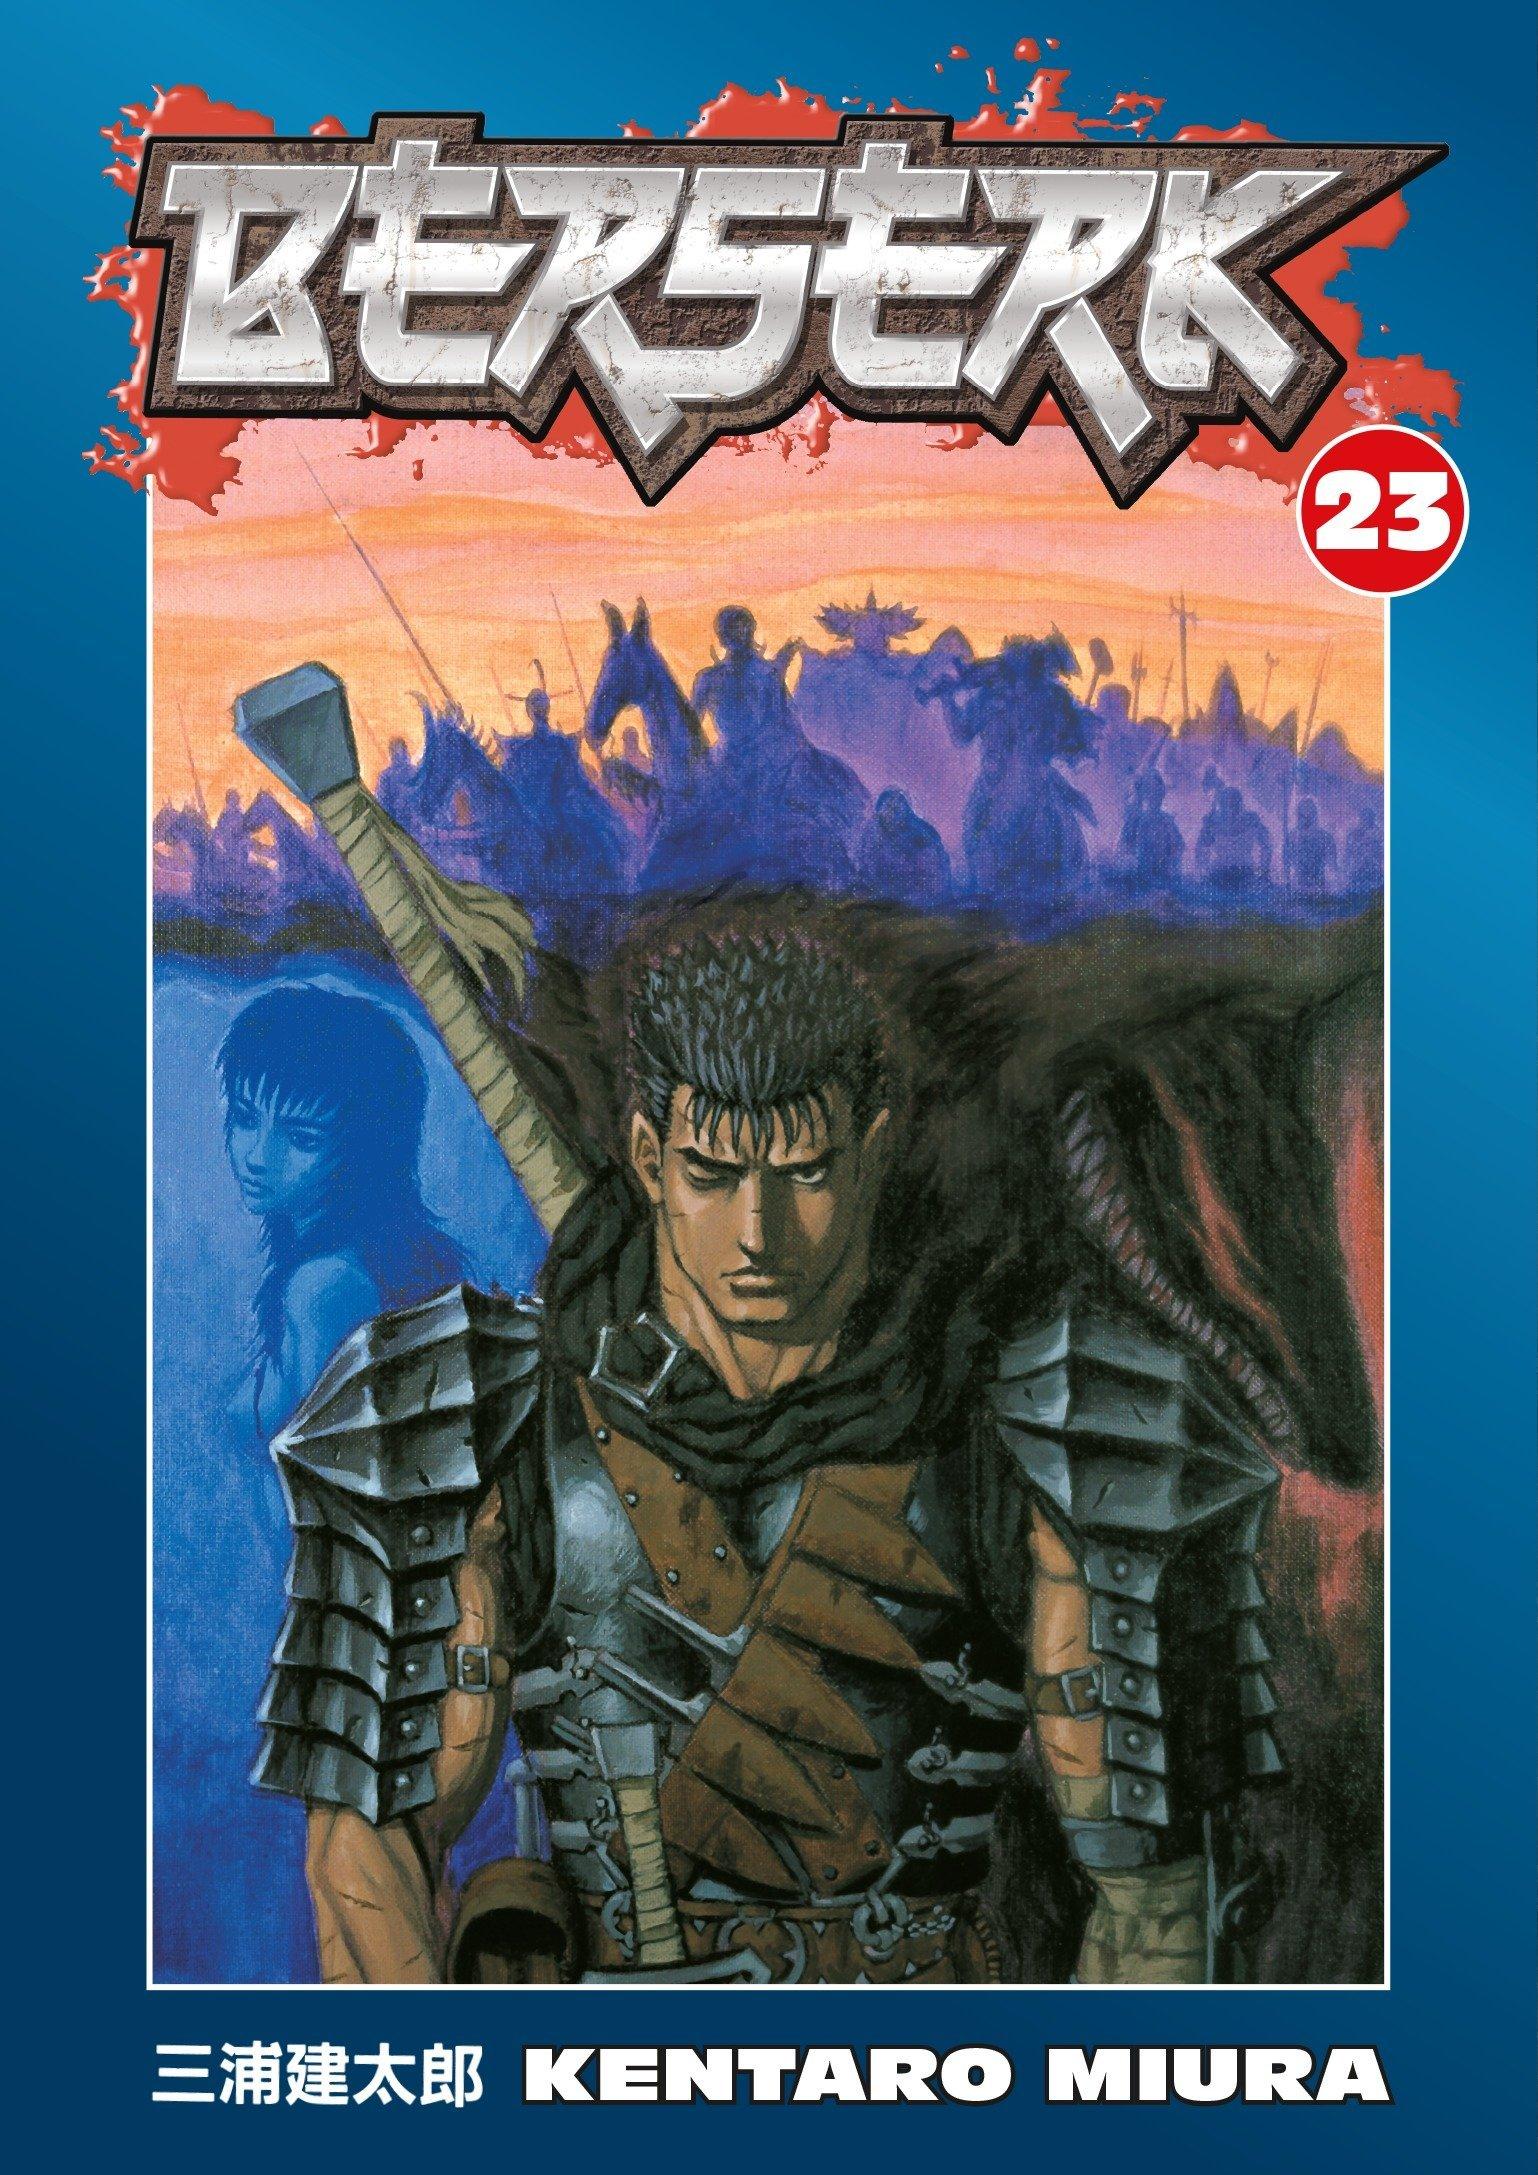 Berserk, Vol. 23: Kentaro Miura, Kentaro Miura: 9781593078645: Amazon.com:  Books